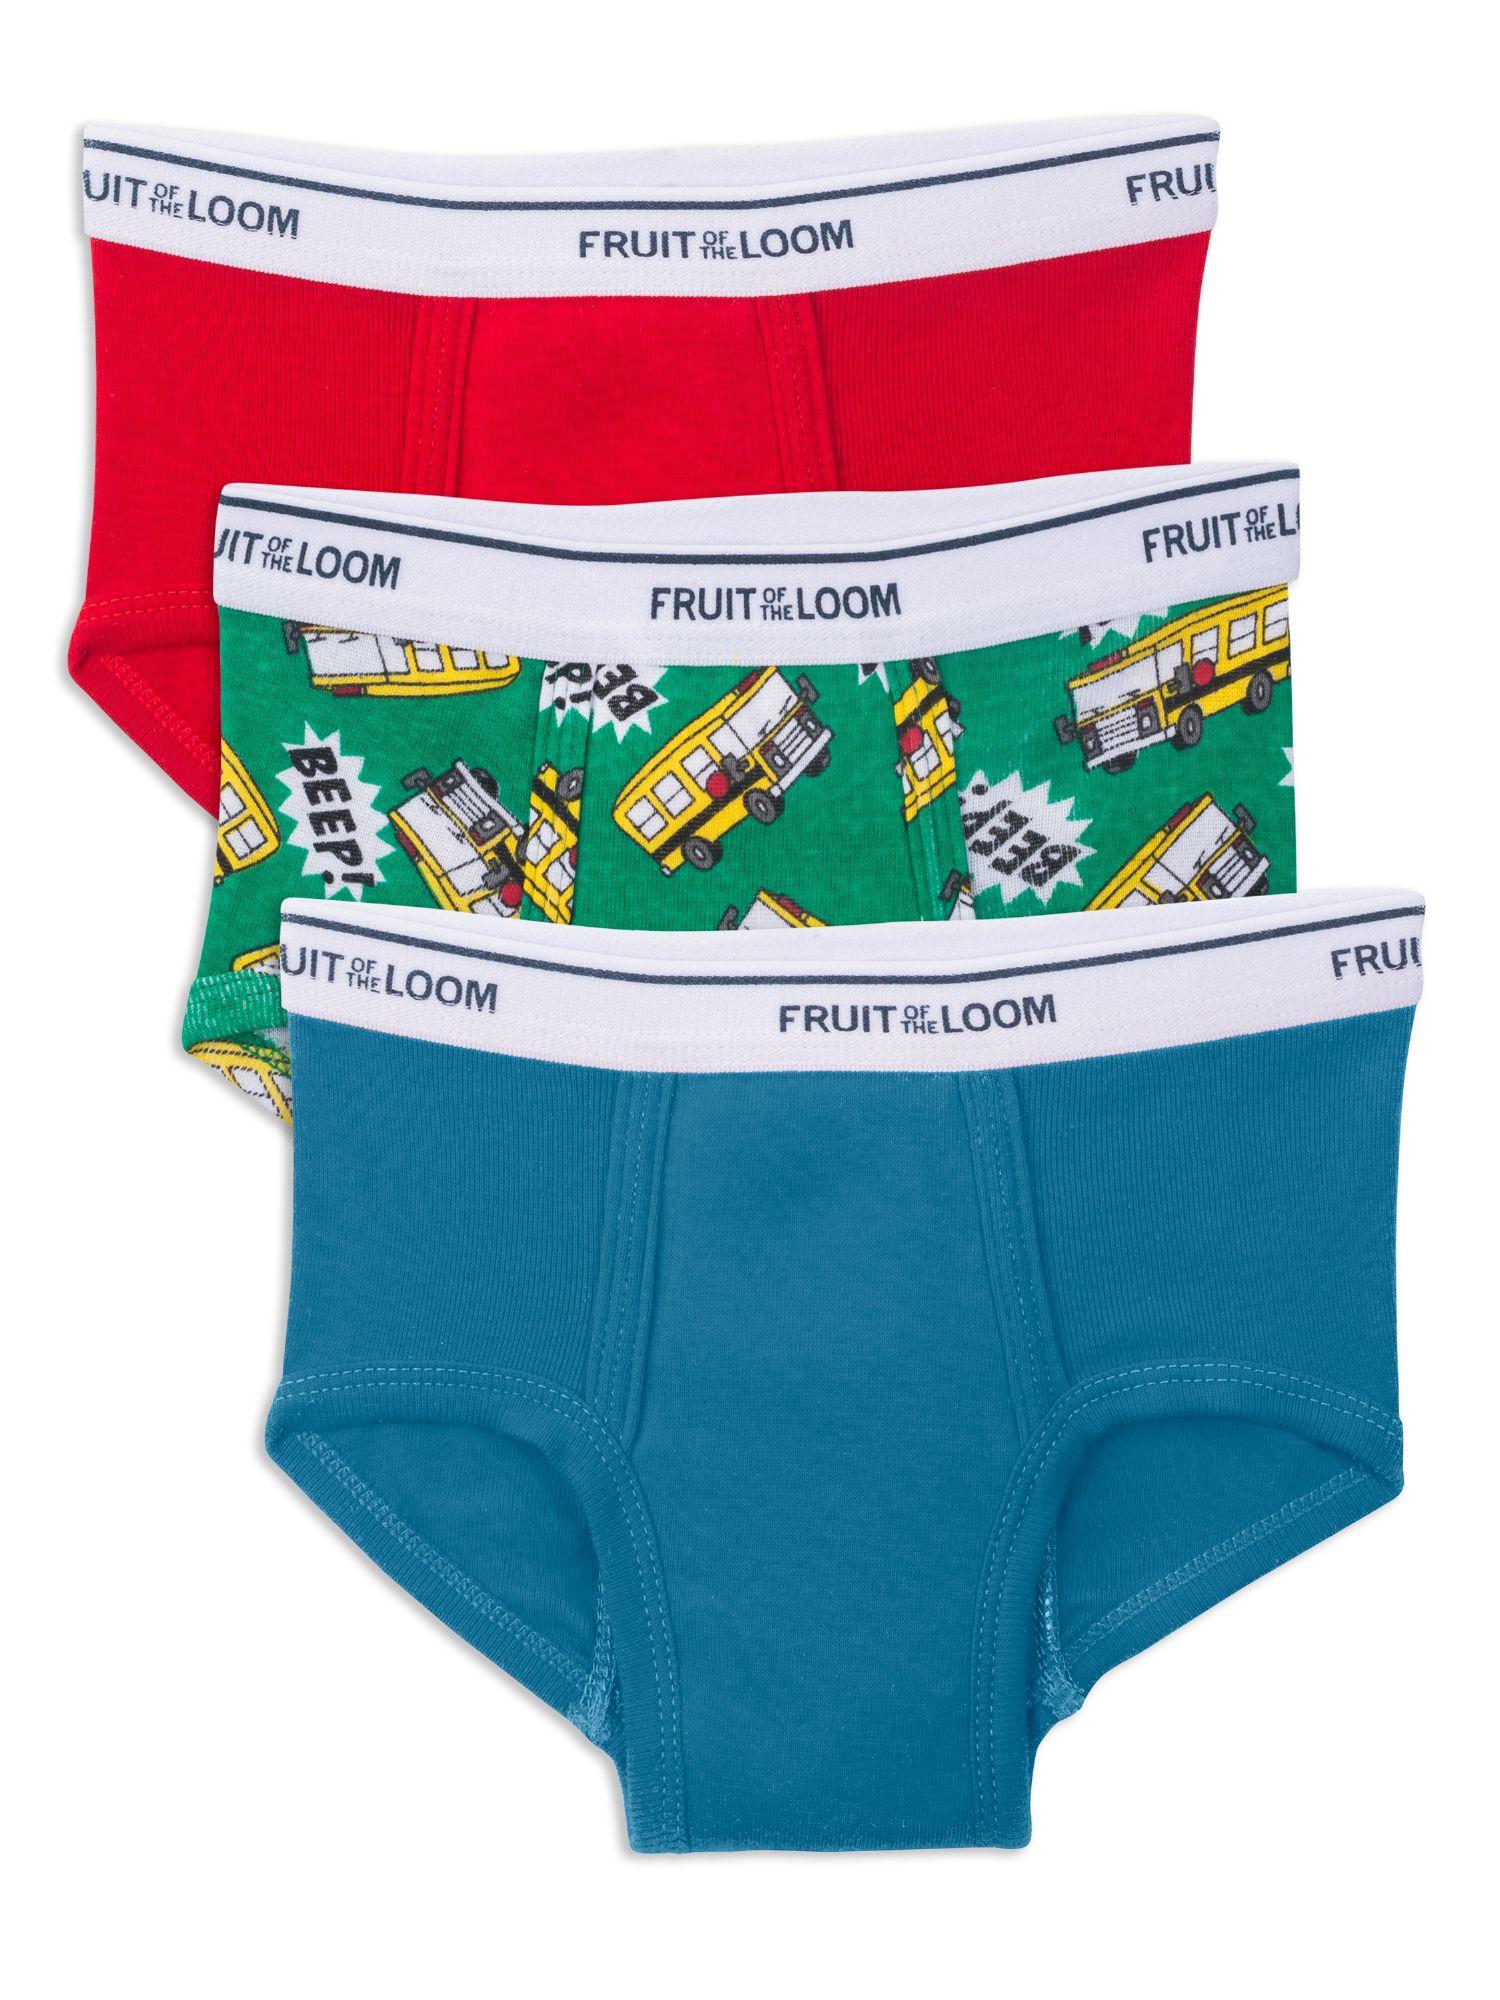 Potty Training Pants, 3 Pack (Toddler Boy)